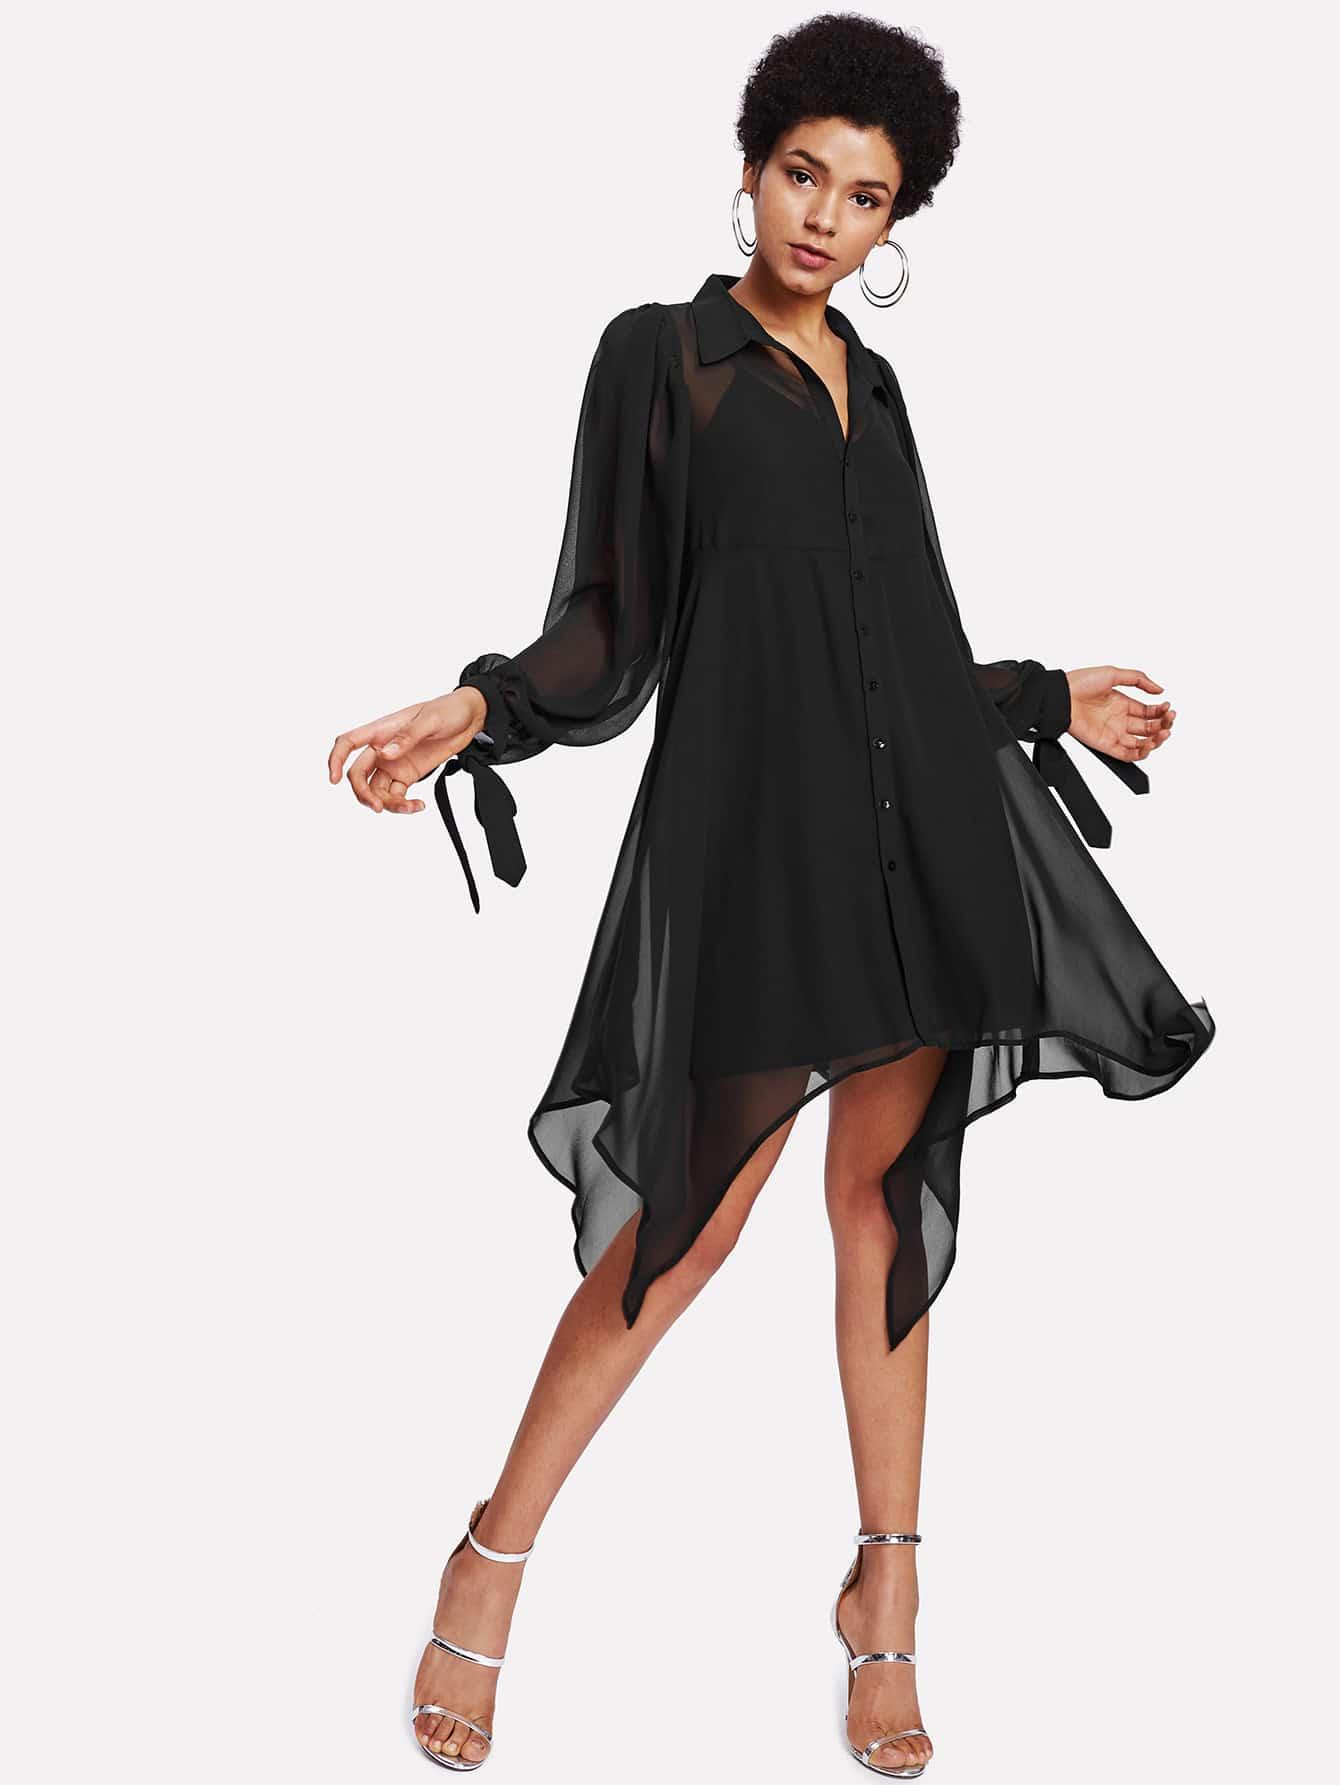 Knot Cuff Hanky Hem 2 In 1 Dress high slit hanky hem metallic halter dress